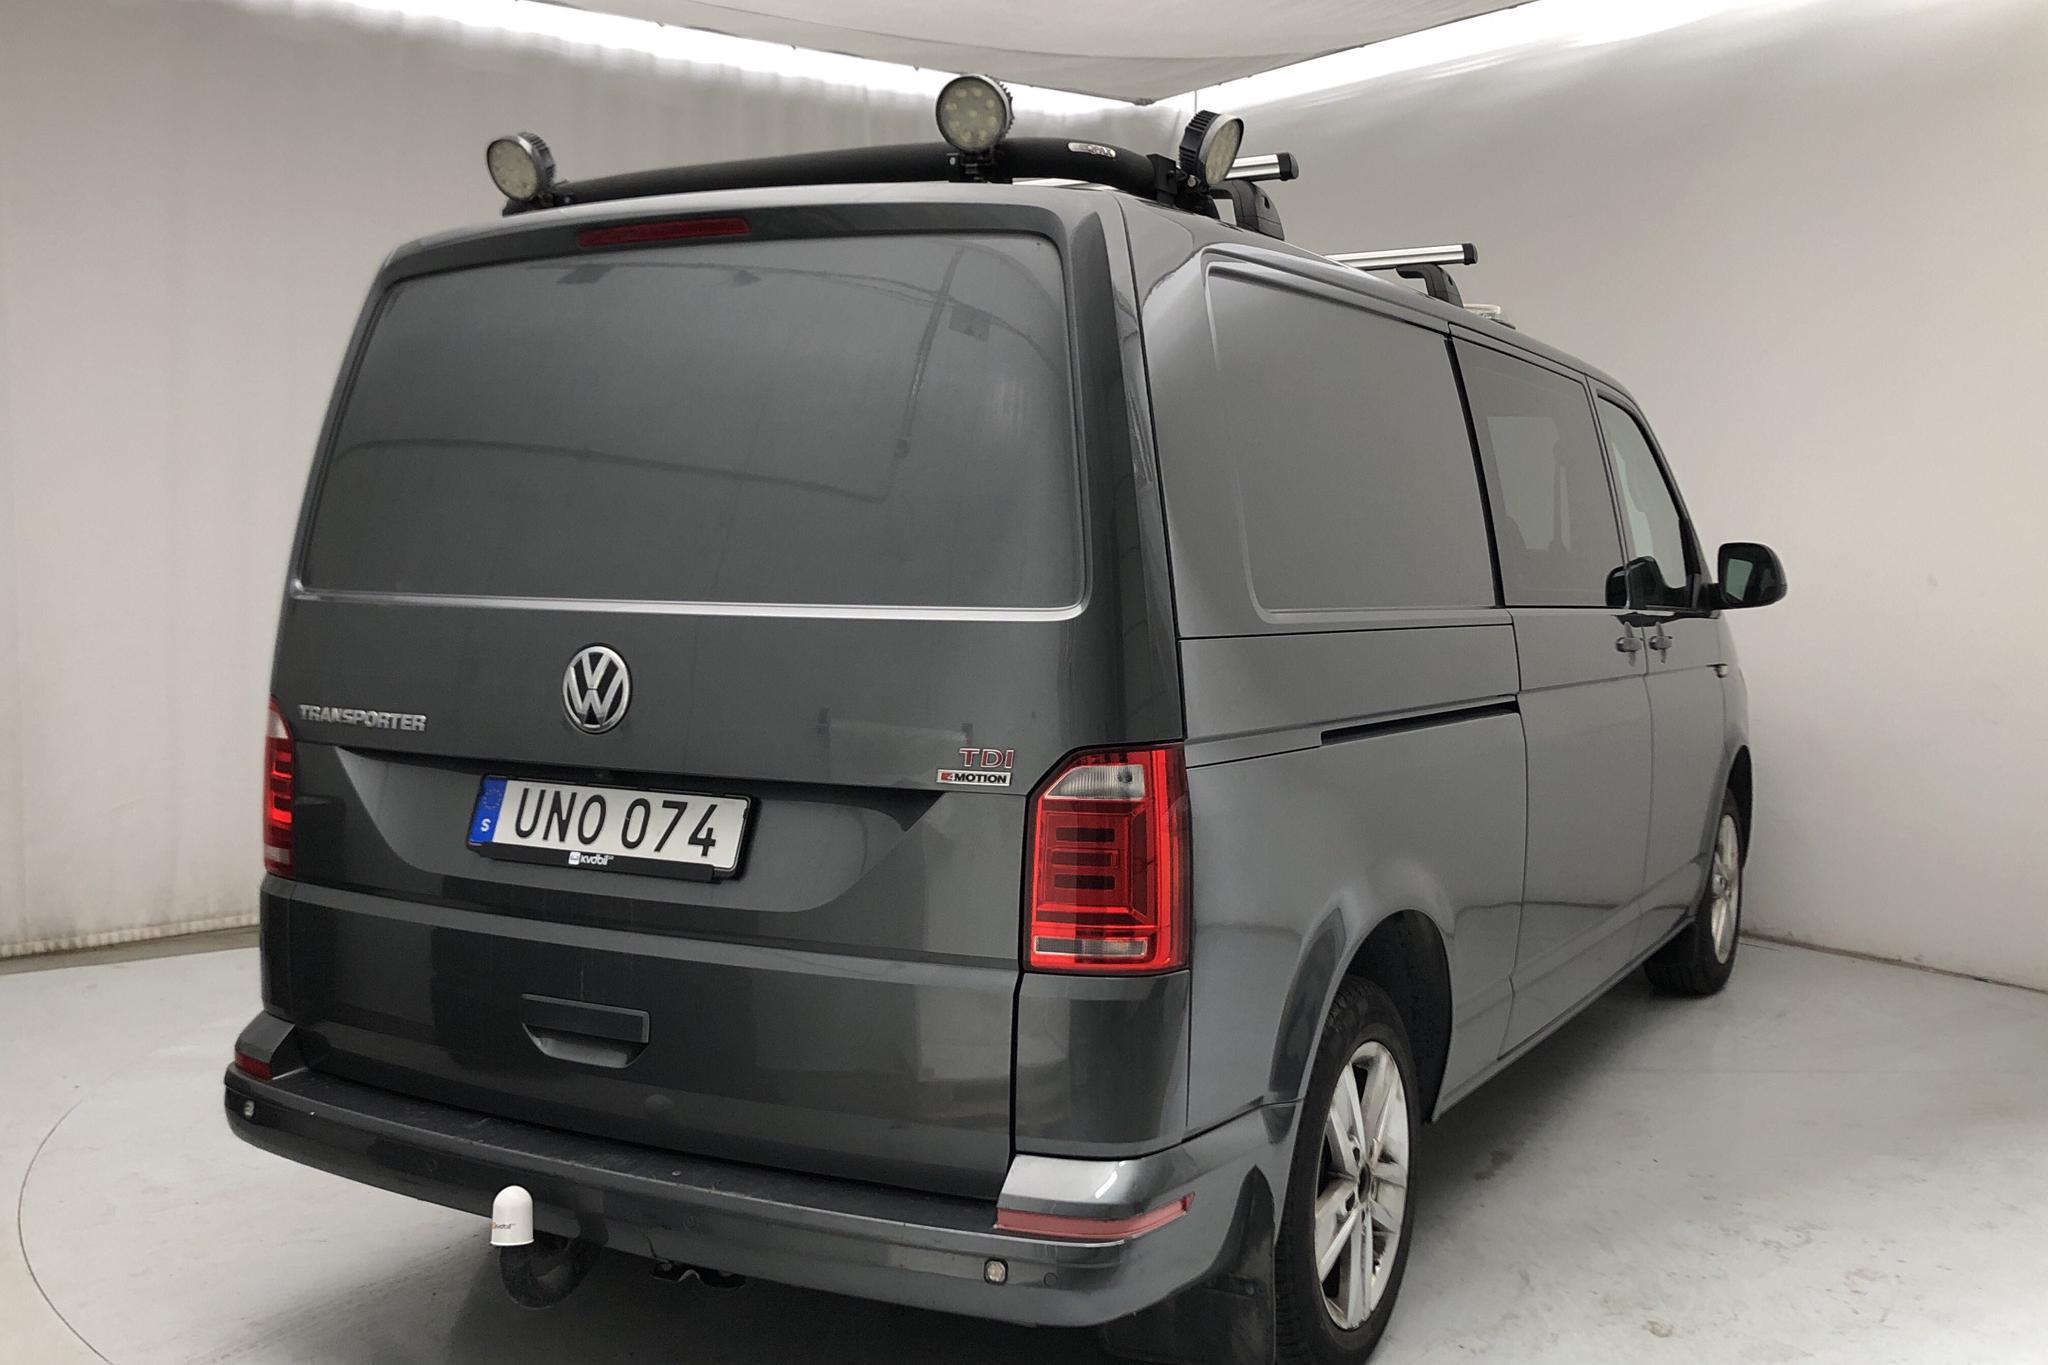 VW Transporter Kombi T6 2.0 TDI BMT 4MOTION (204hk) - 17 849 mil - Automat - grå - 2016